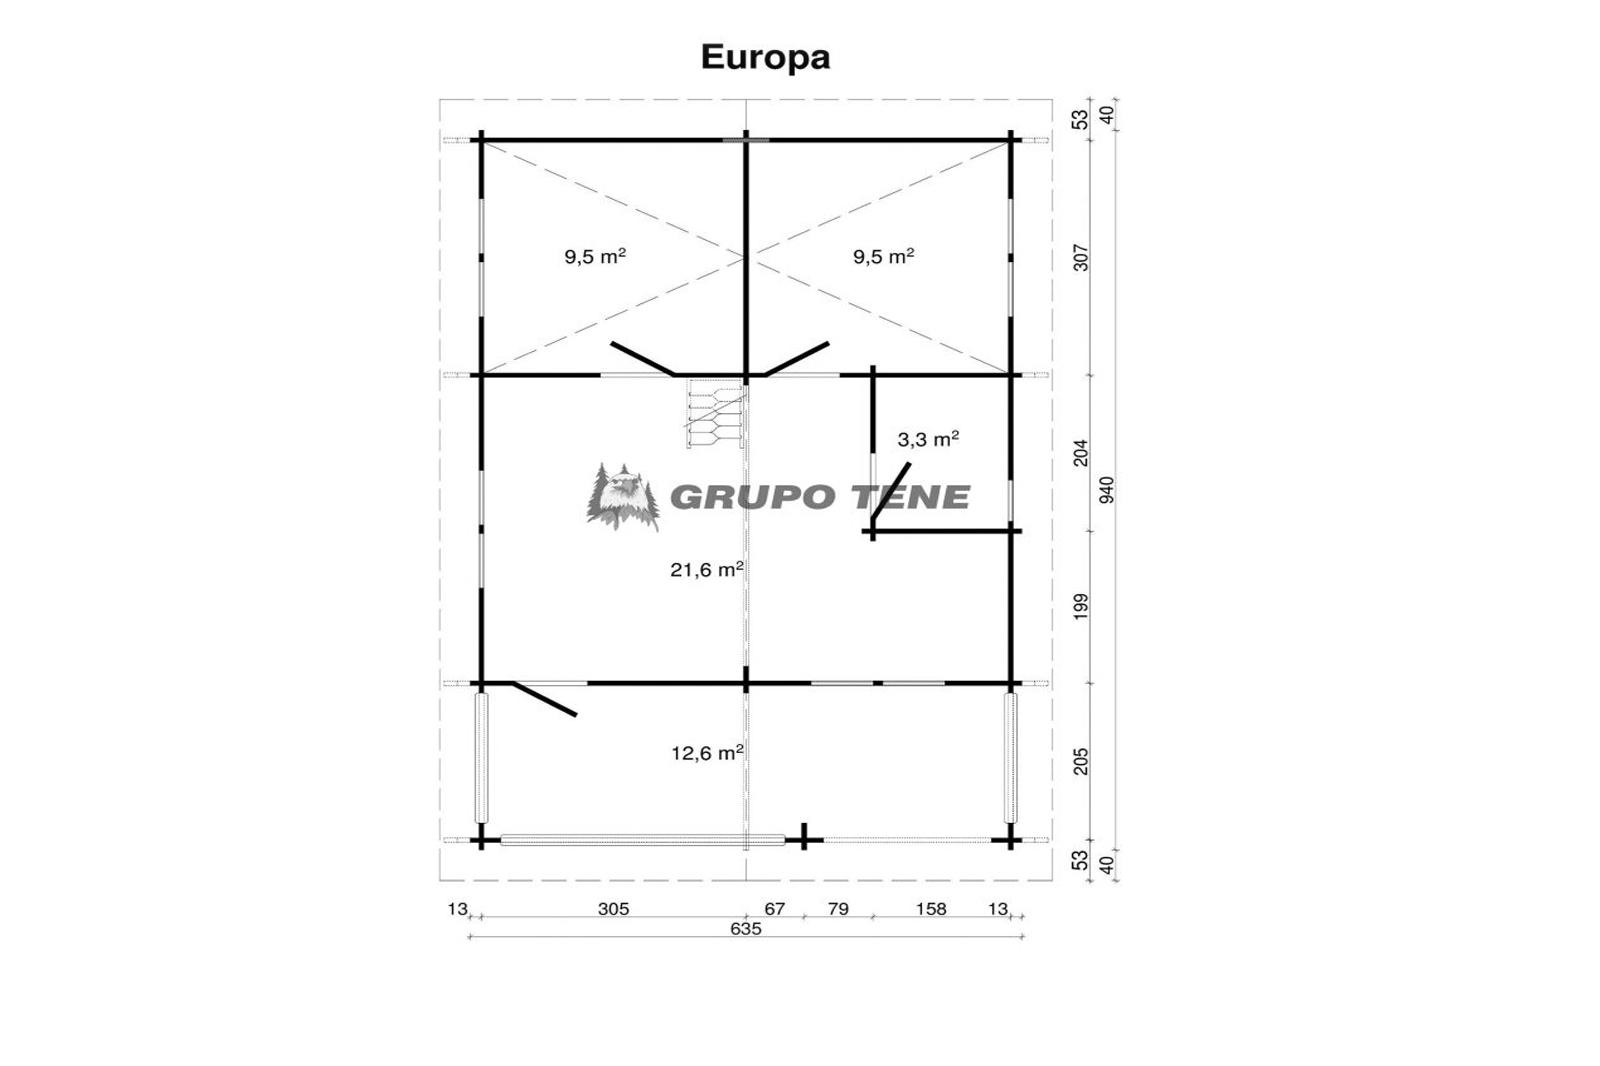 plano-europa